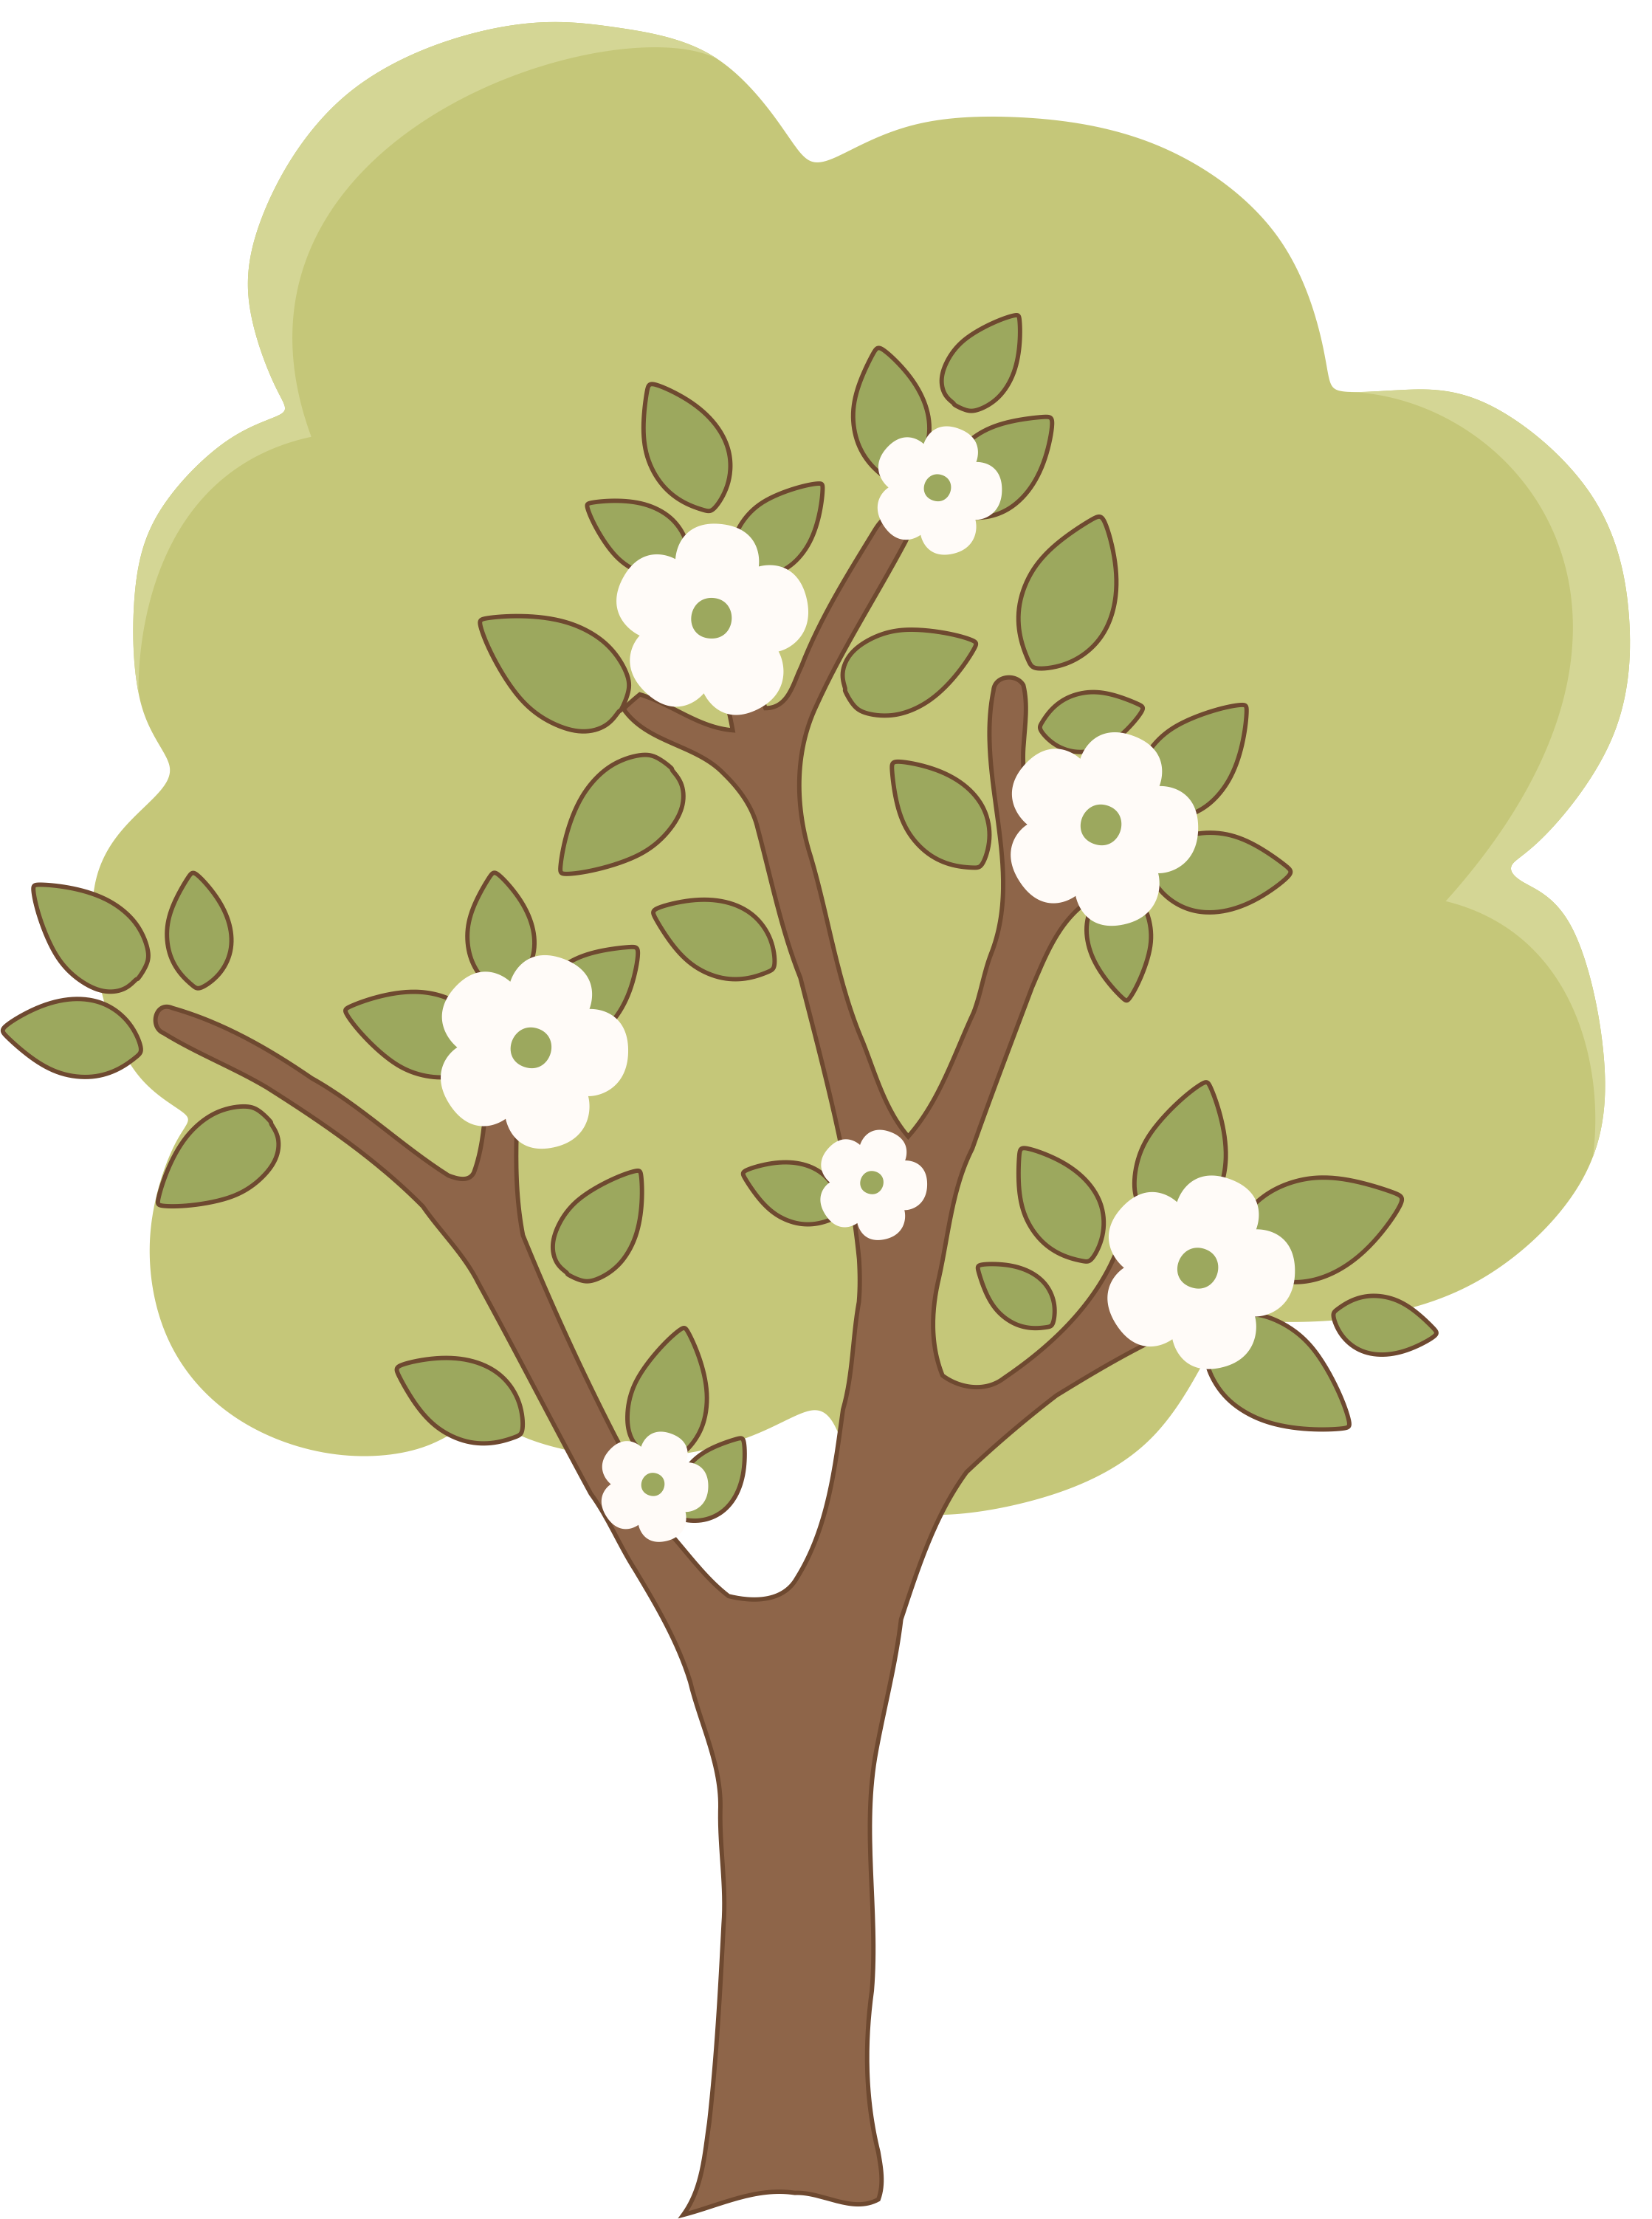 4 seasons tree clipart graphic freeuse download Photo by @daniellemoraesfalcao - Minus | Clip Art-Flowers/Bugs ... graphic freeuse download